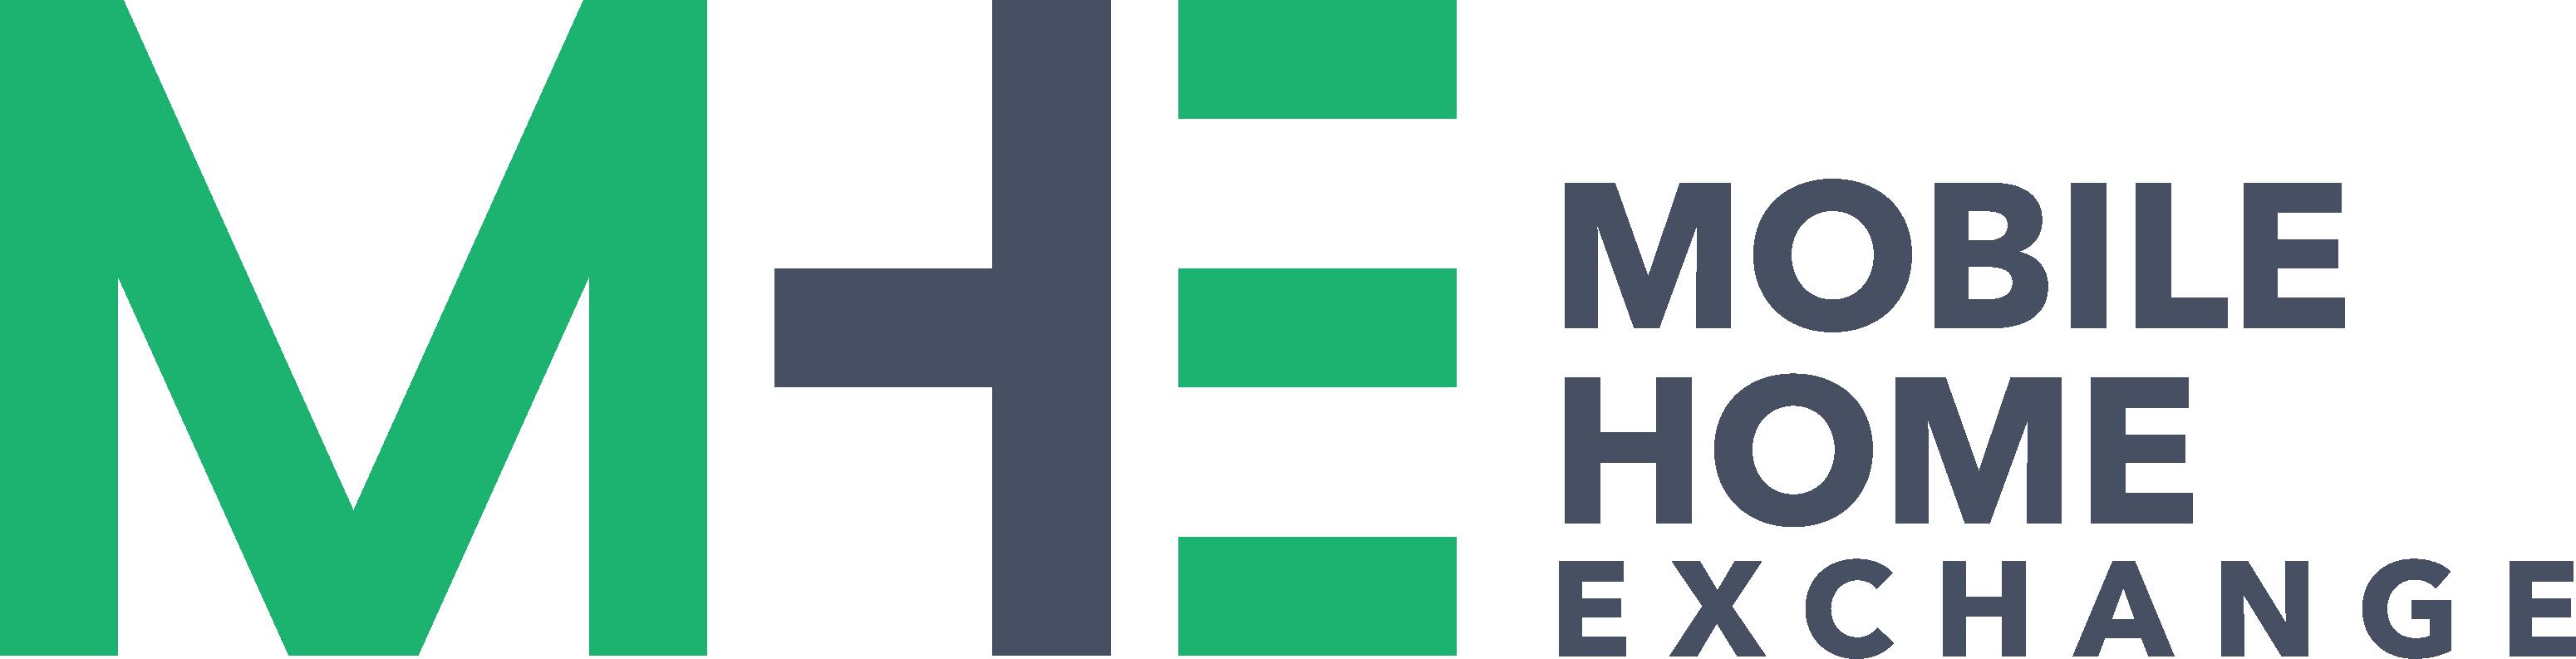 Mobile Home Exchange LLC.